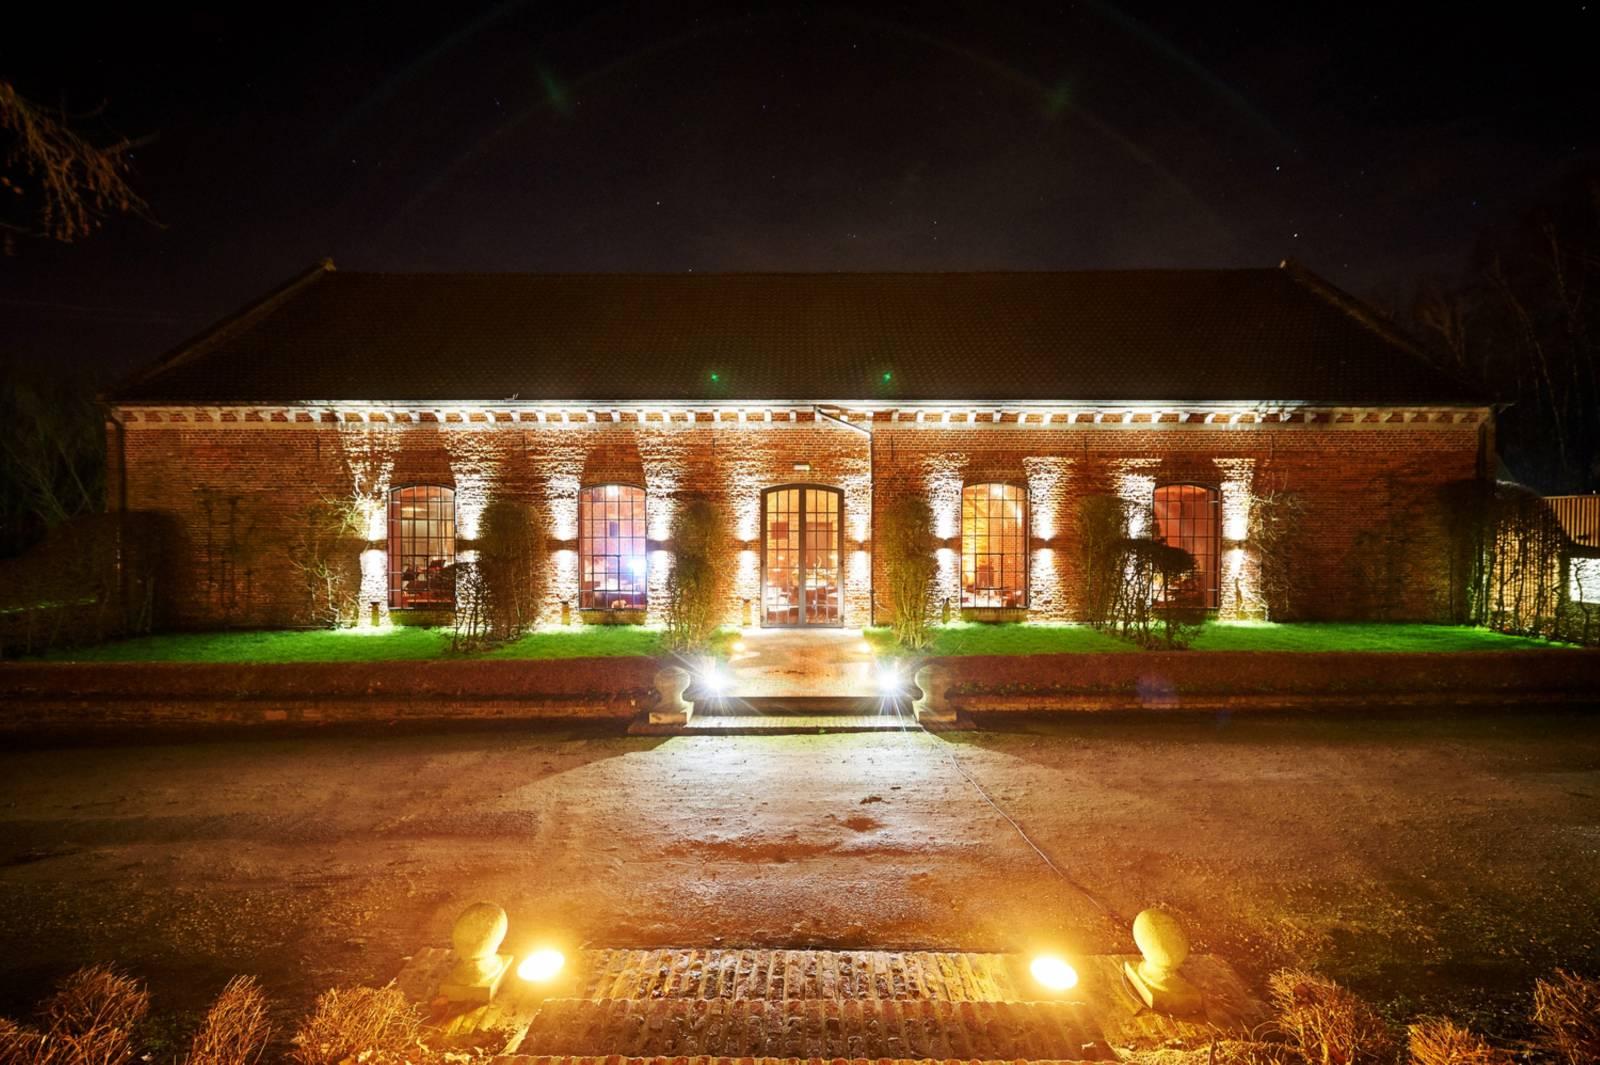 La ferme de Balingue House of Weddings feestzaal salle de fete lieu exceptionnel huwelijk mariage trouwen trouwzaal Brusse (6)